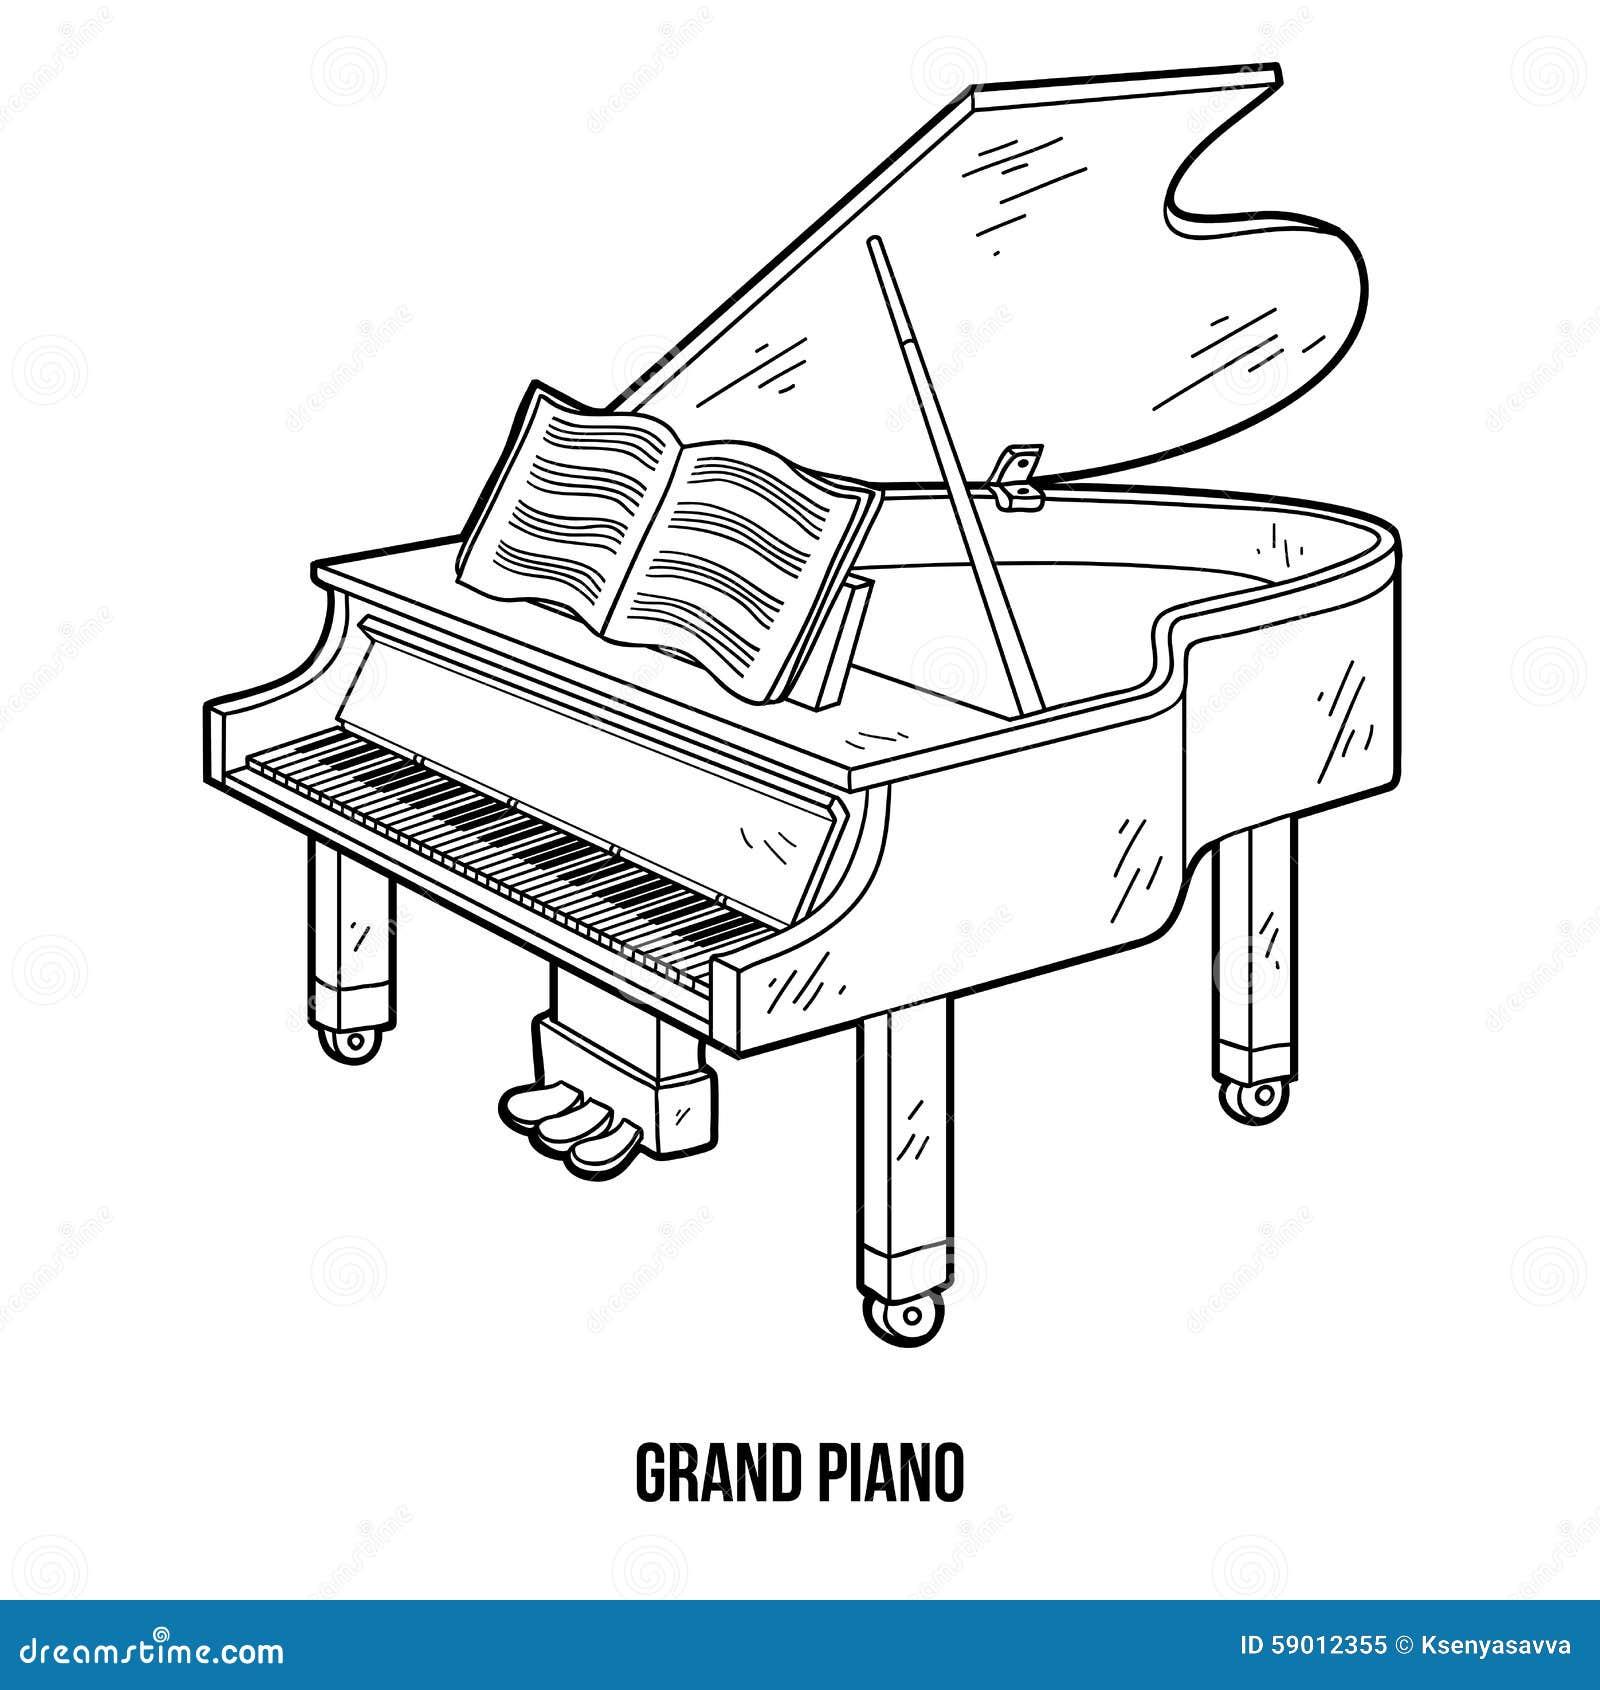 Livre de coloriage instruments de musique piano queue for Disegno di piano domestico